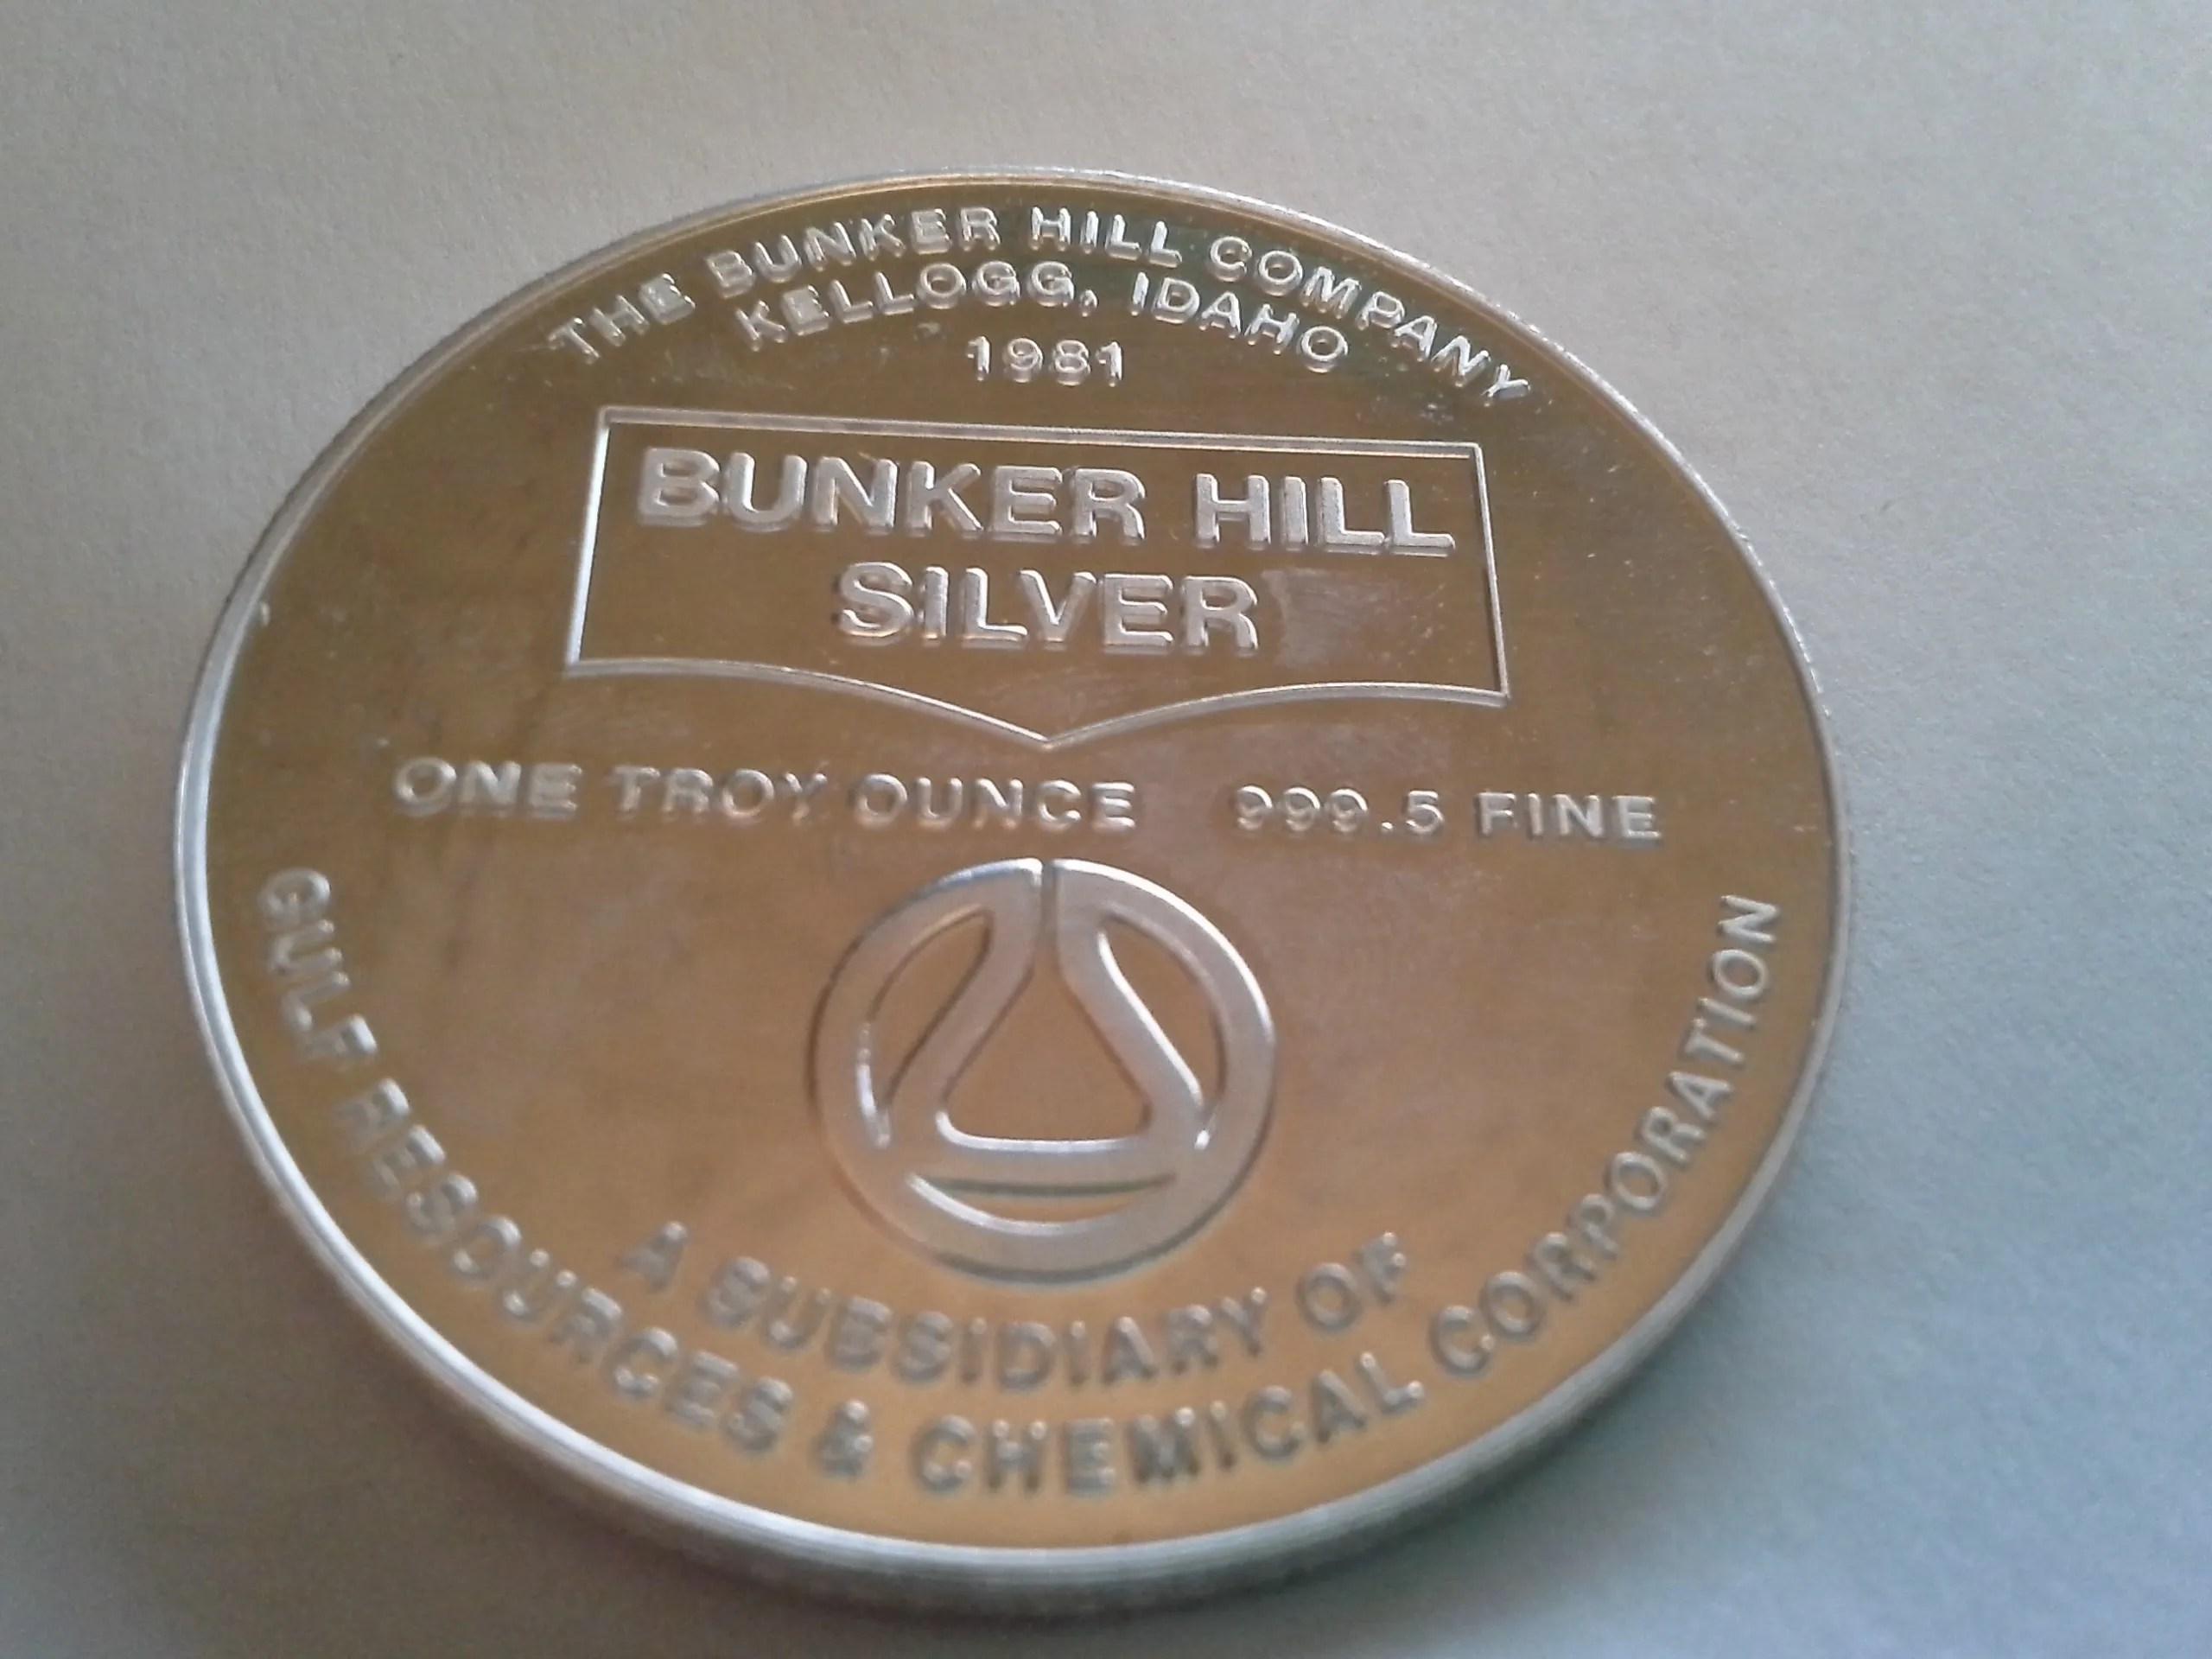 1981 Bh 1 Bunker Hill Company Medallion Series 9995 Fine